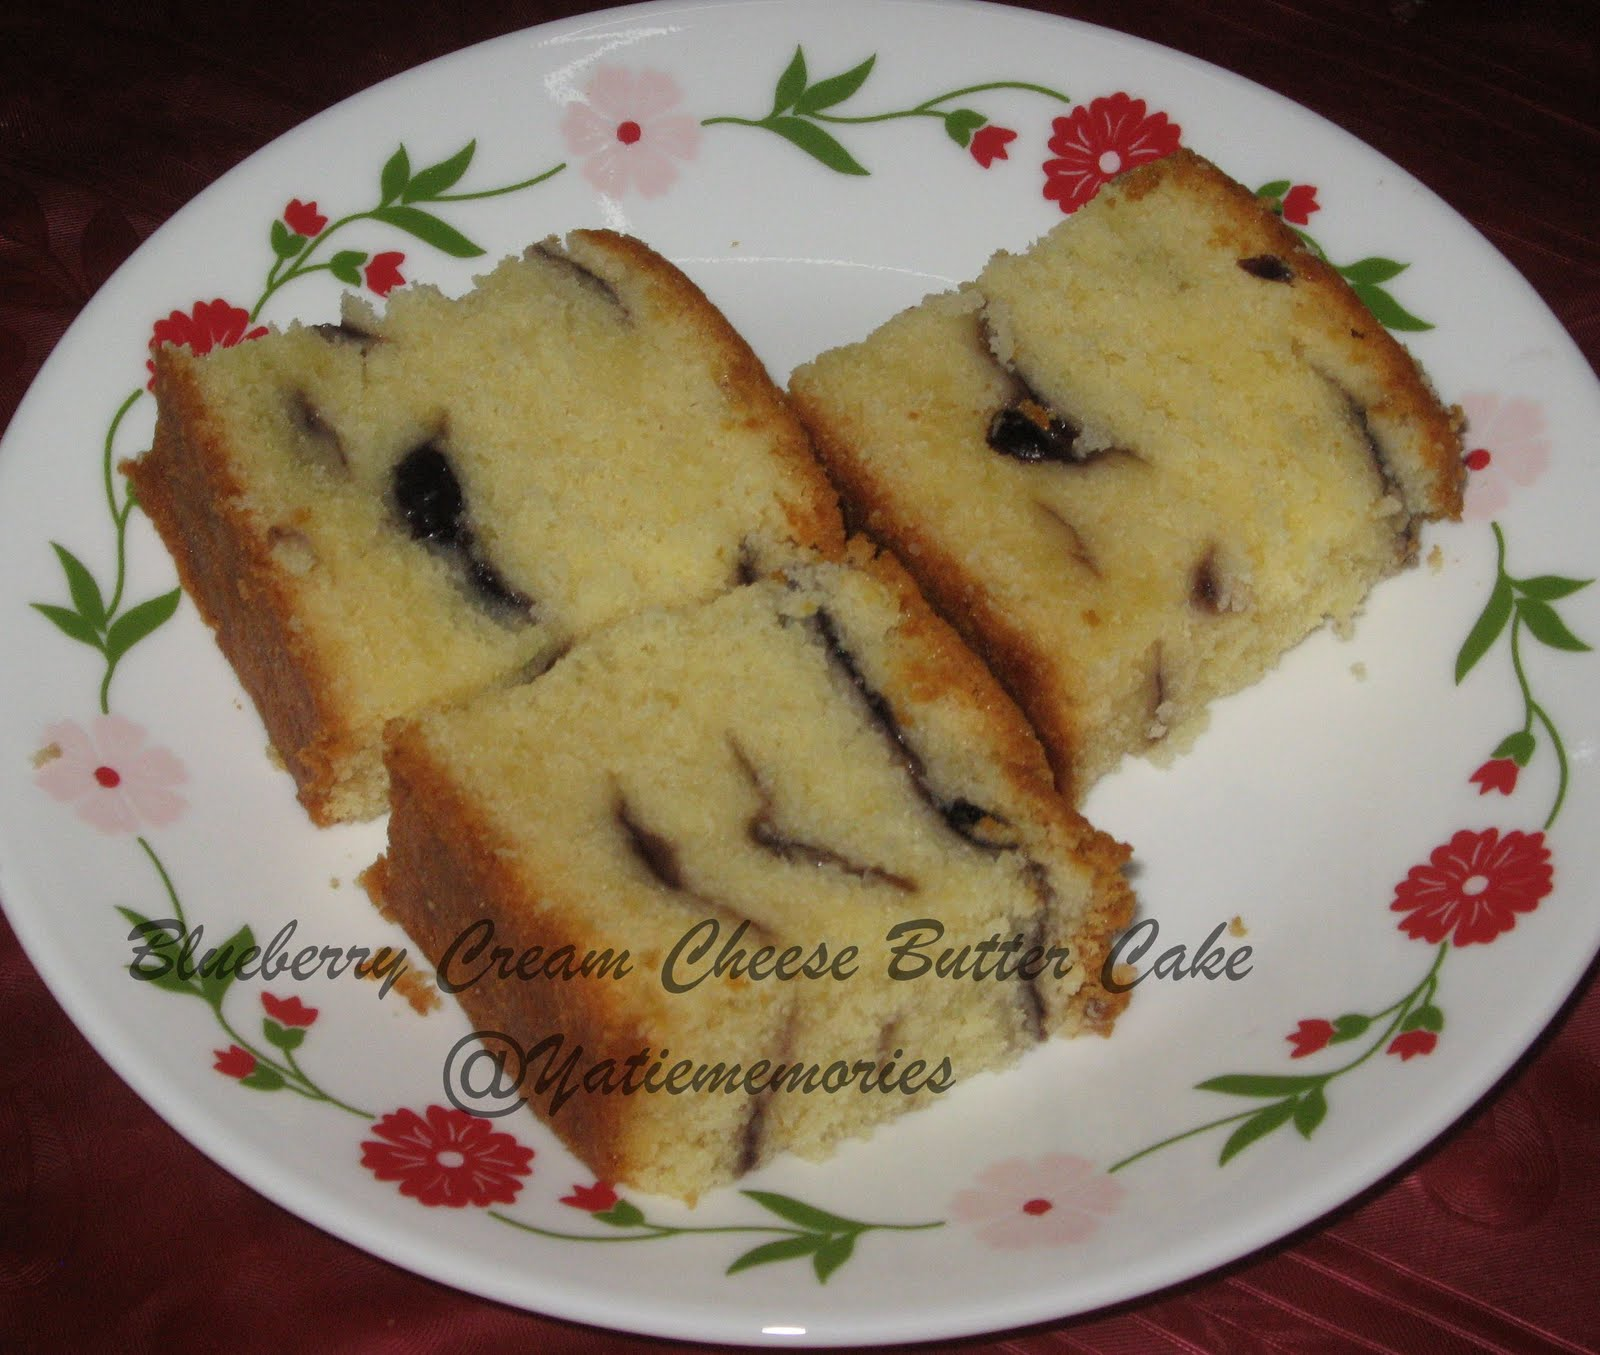 Sinar Kehidupanku**~::..: Blueberry Cream Cheese Butter Cake